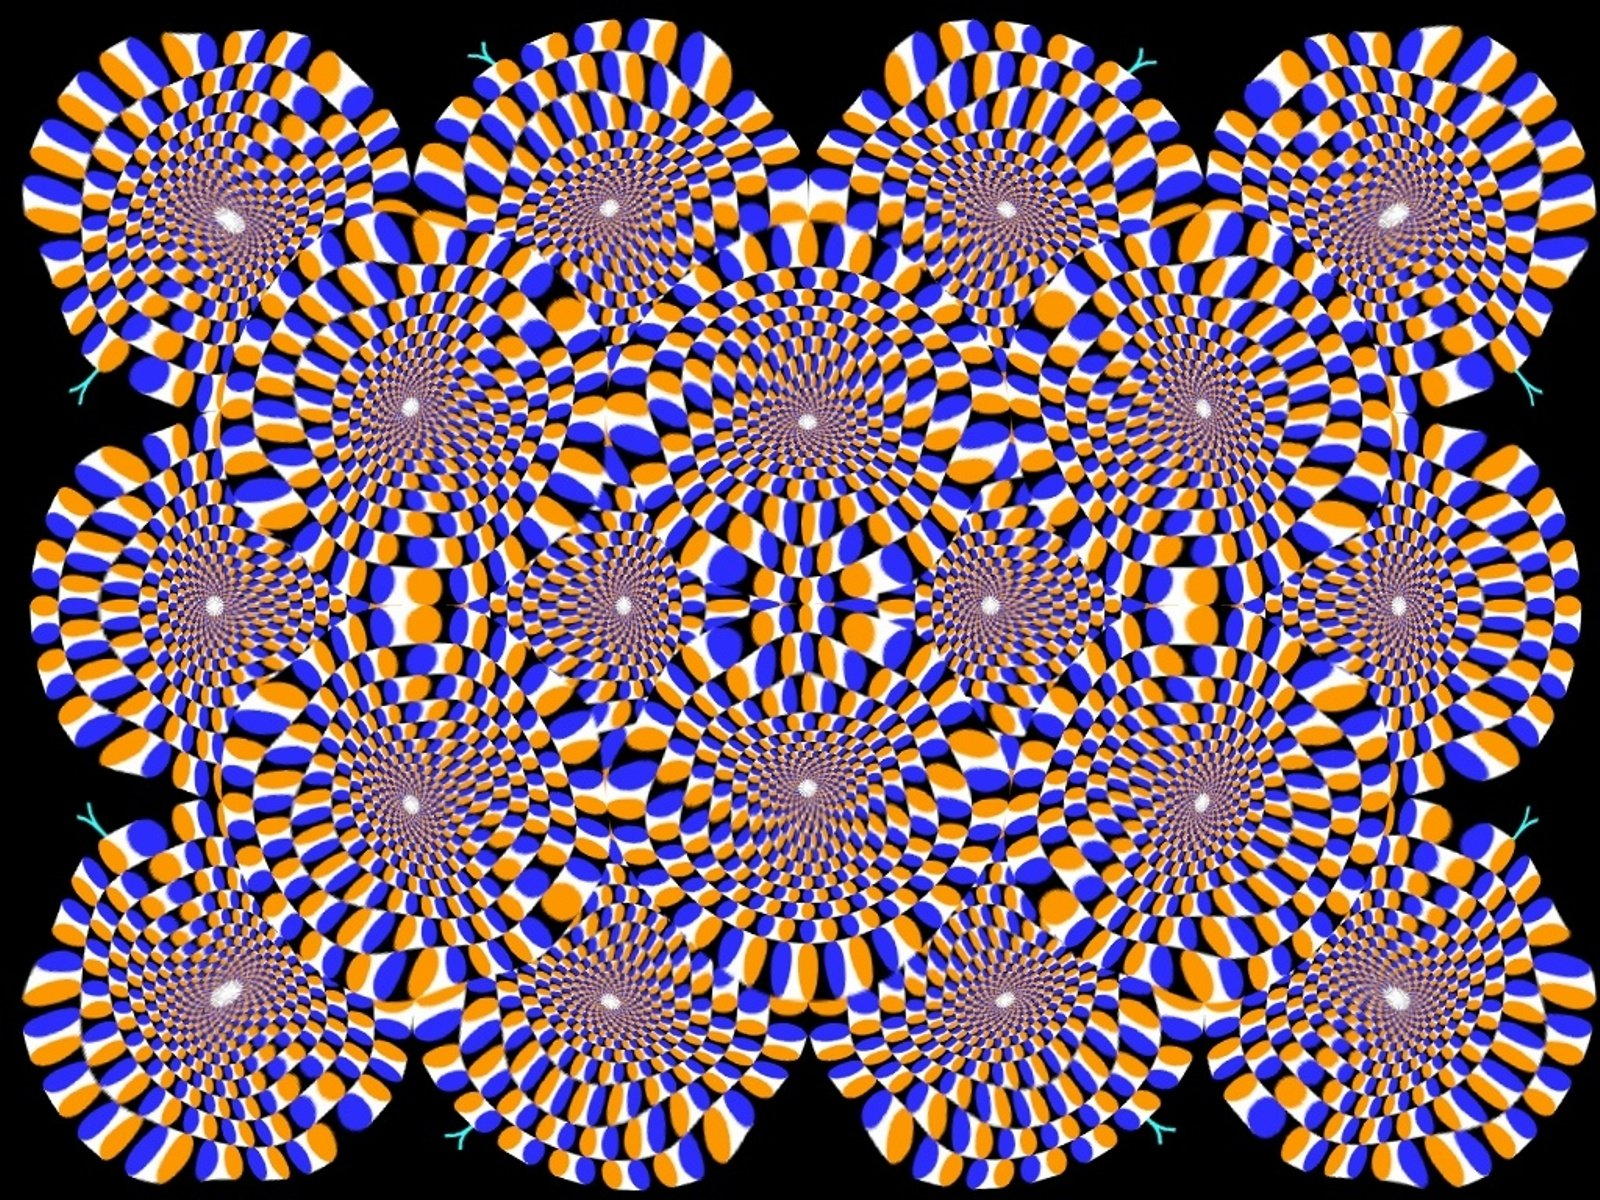 Optical Illusions Wallpaper 1600x1200